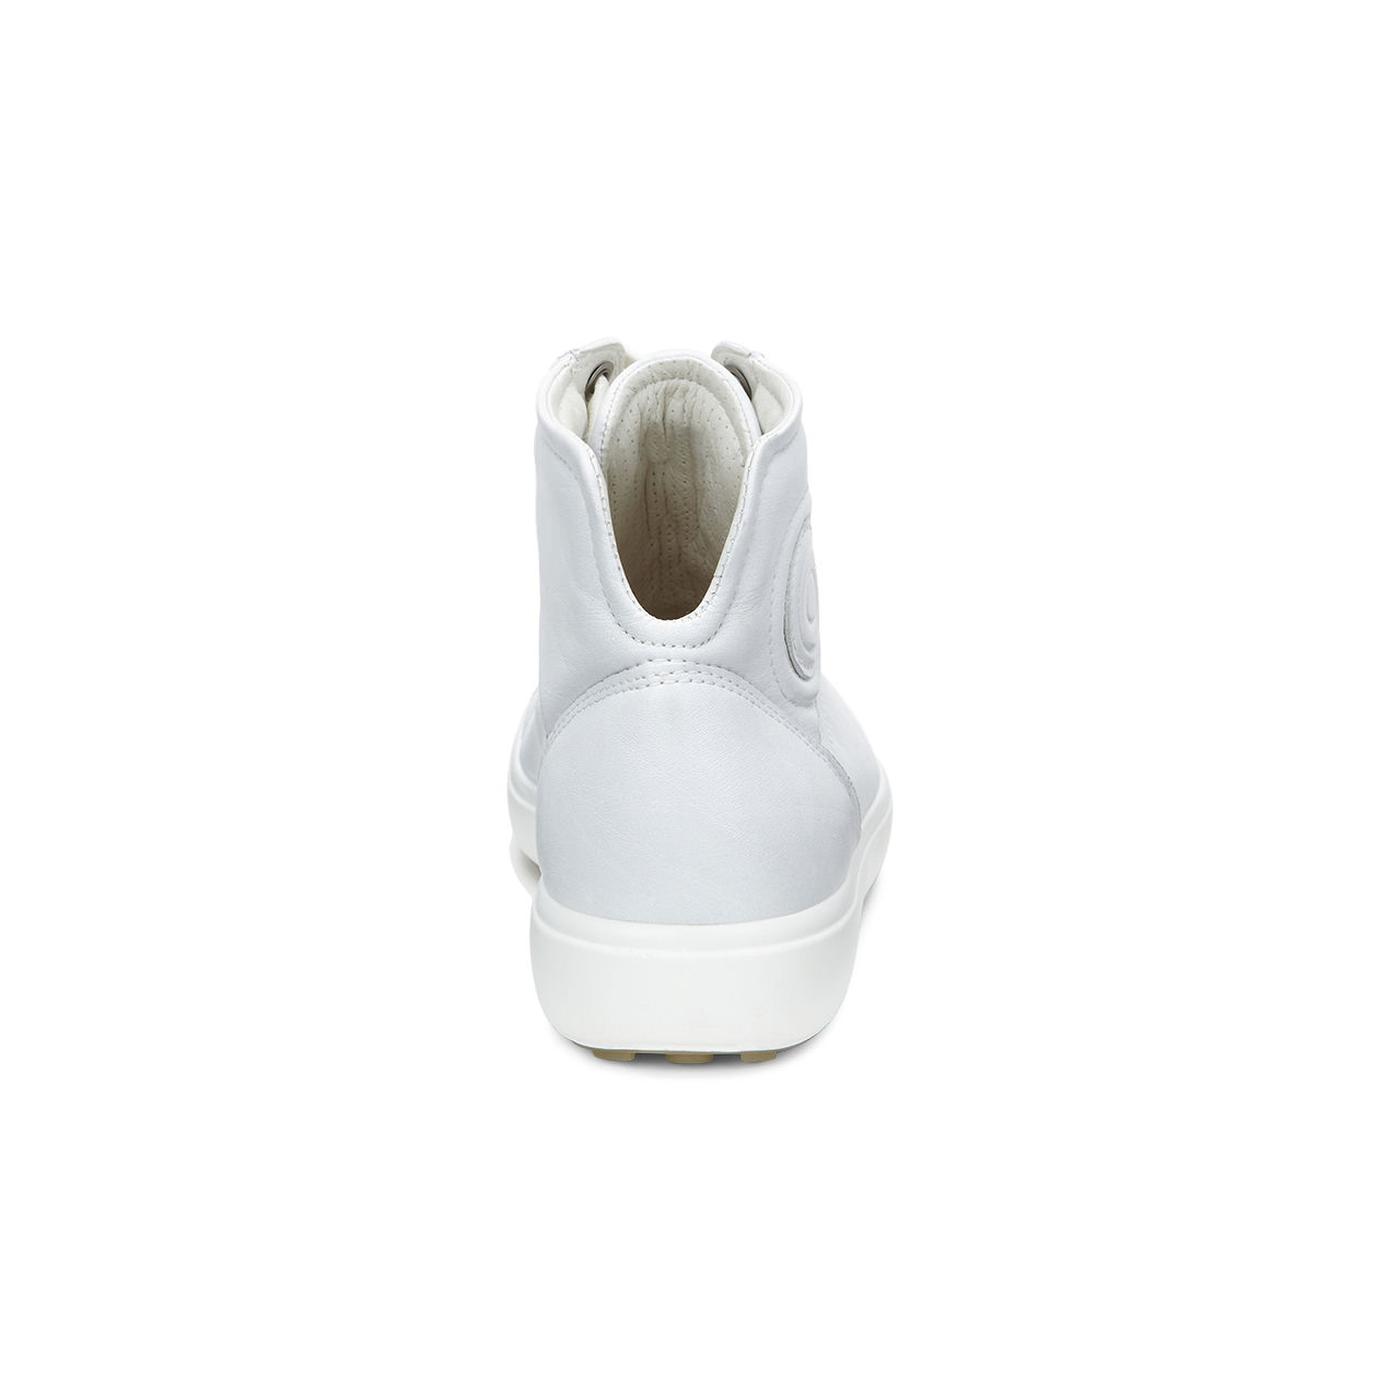 ECCO SOFT 7 Women's High Top Sneaker